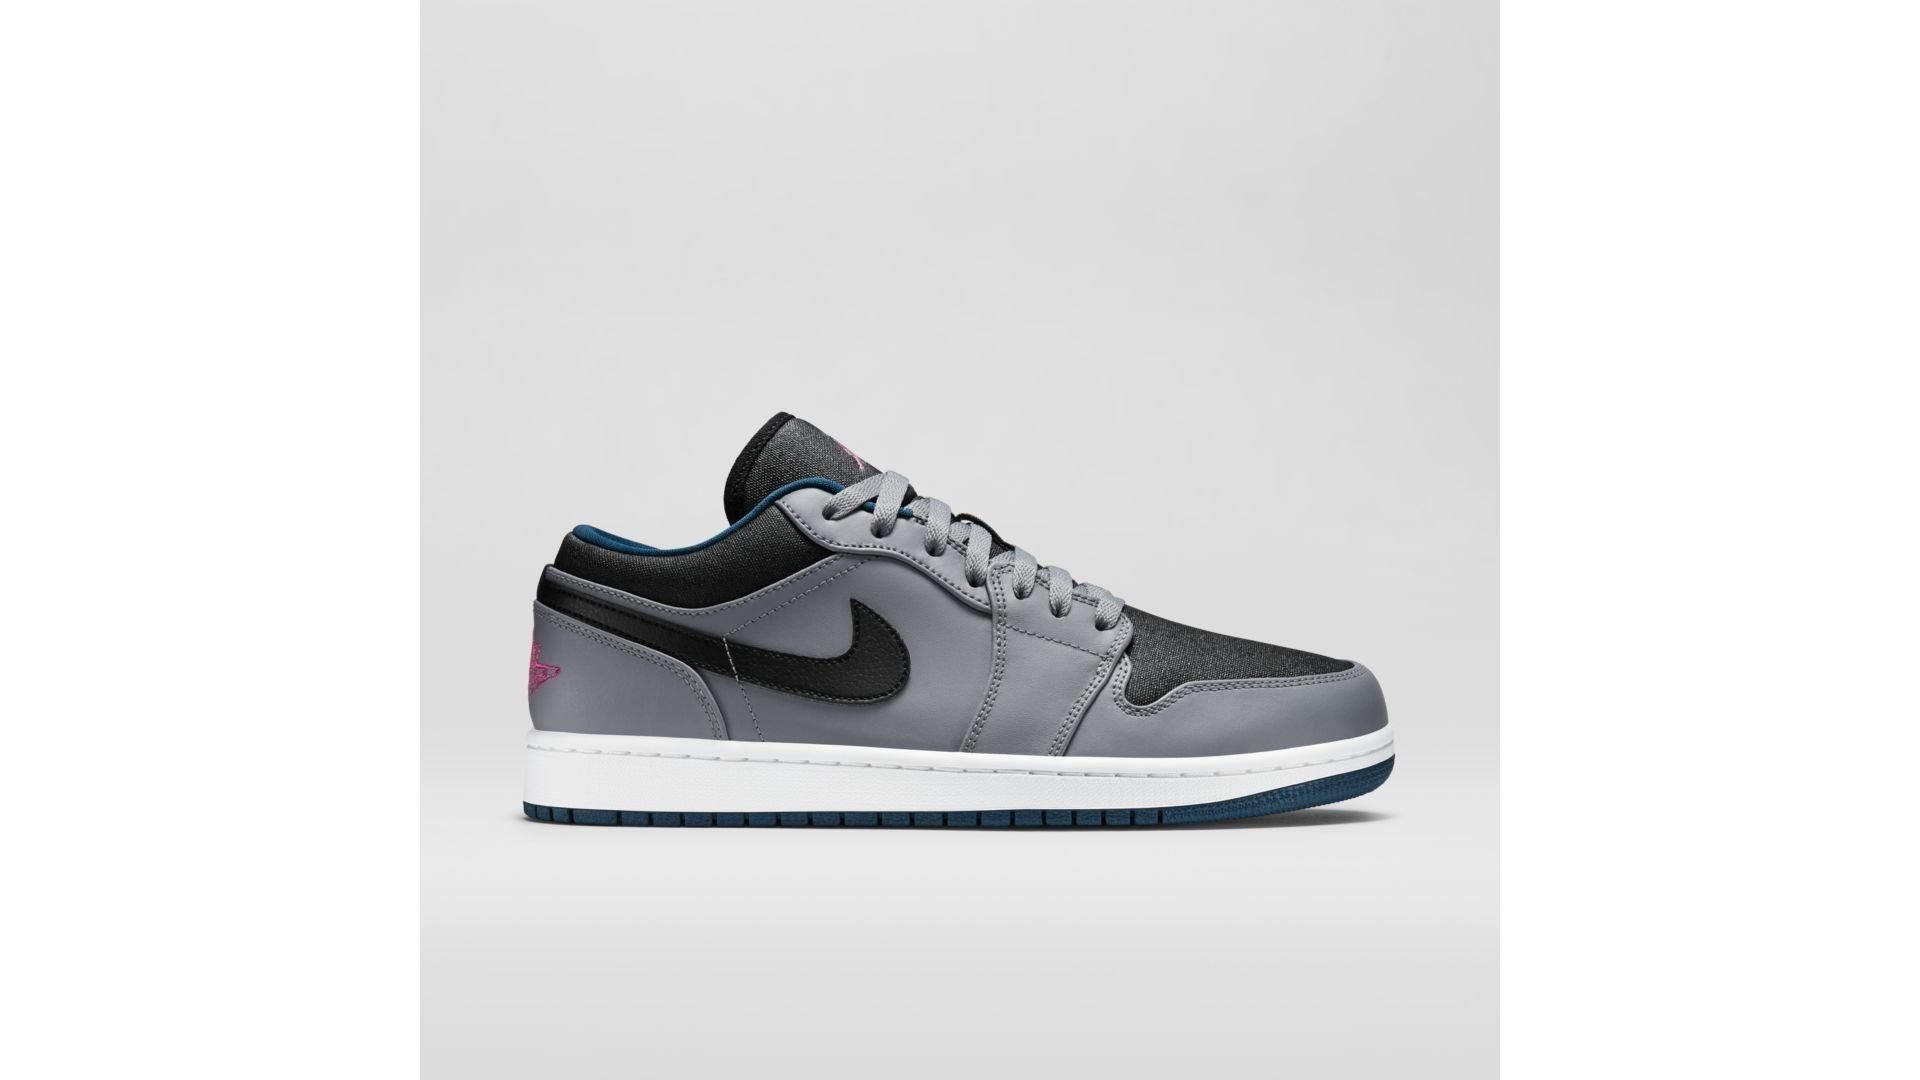 Jordan 1 Low Cool Grey Fusion Pink Space Blue (553558-018)